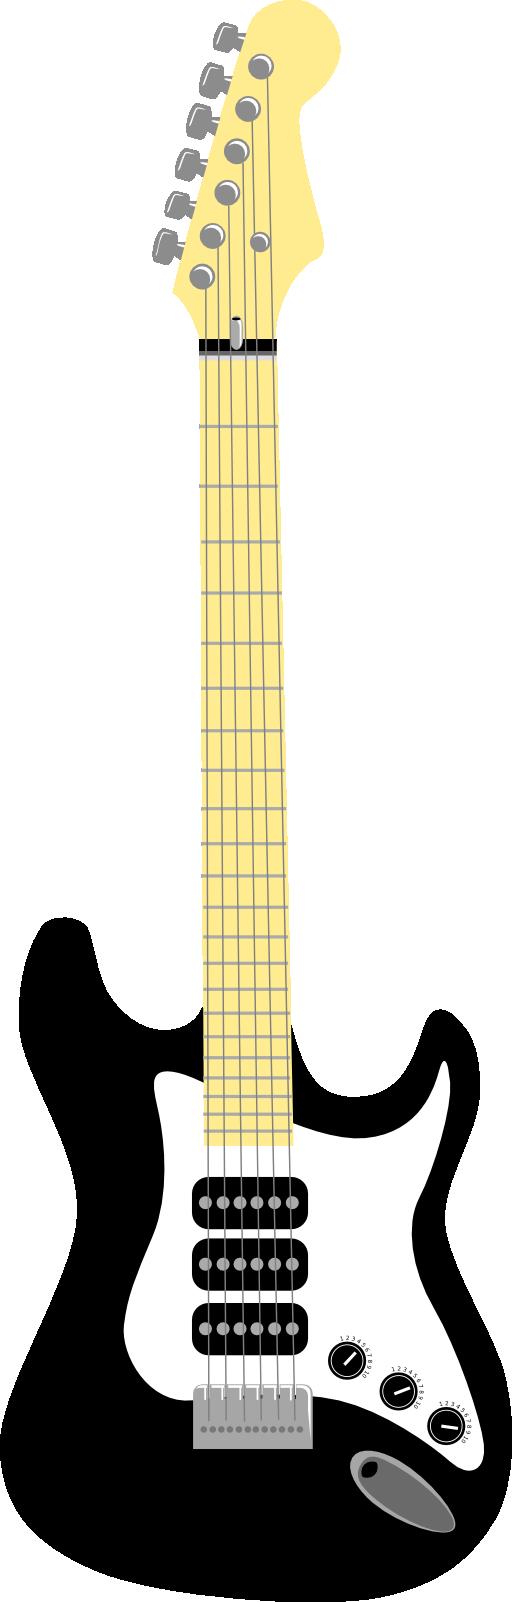 Clip art image panda. Clipart star guitar